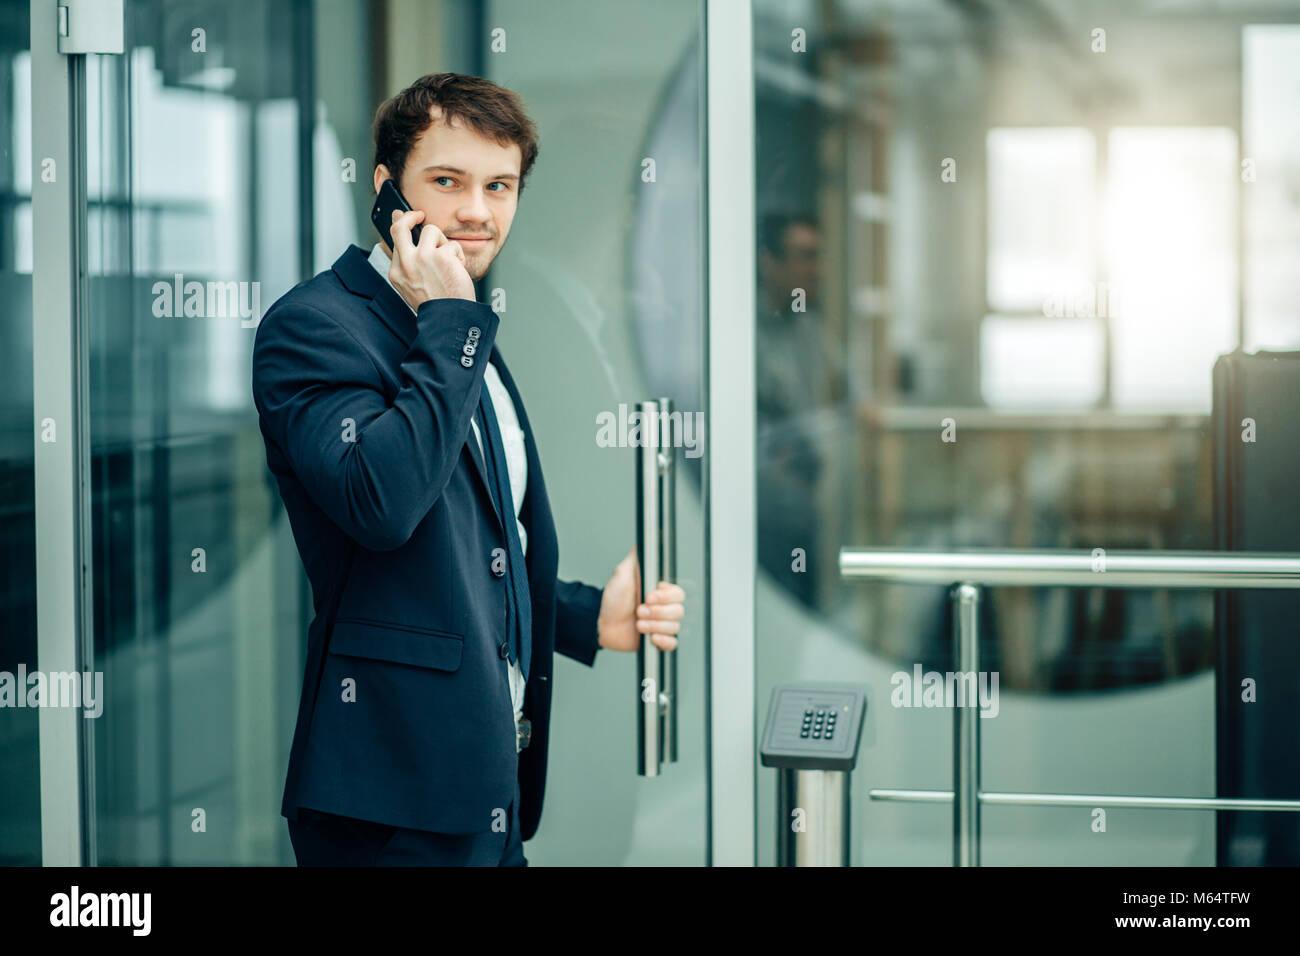 Business Mann während Gespräch am Handy auf dem Weg zur Arbeit Stockbild